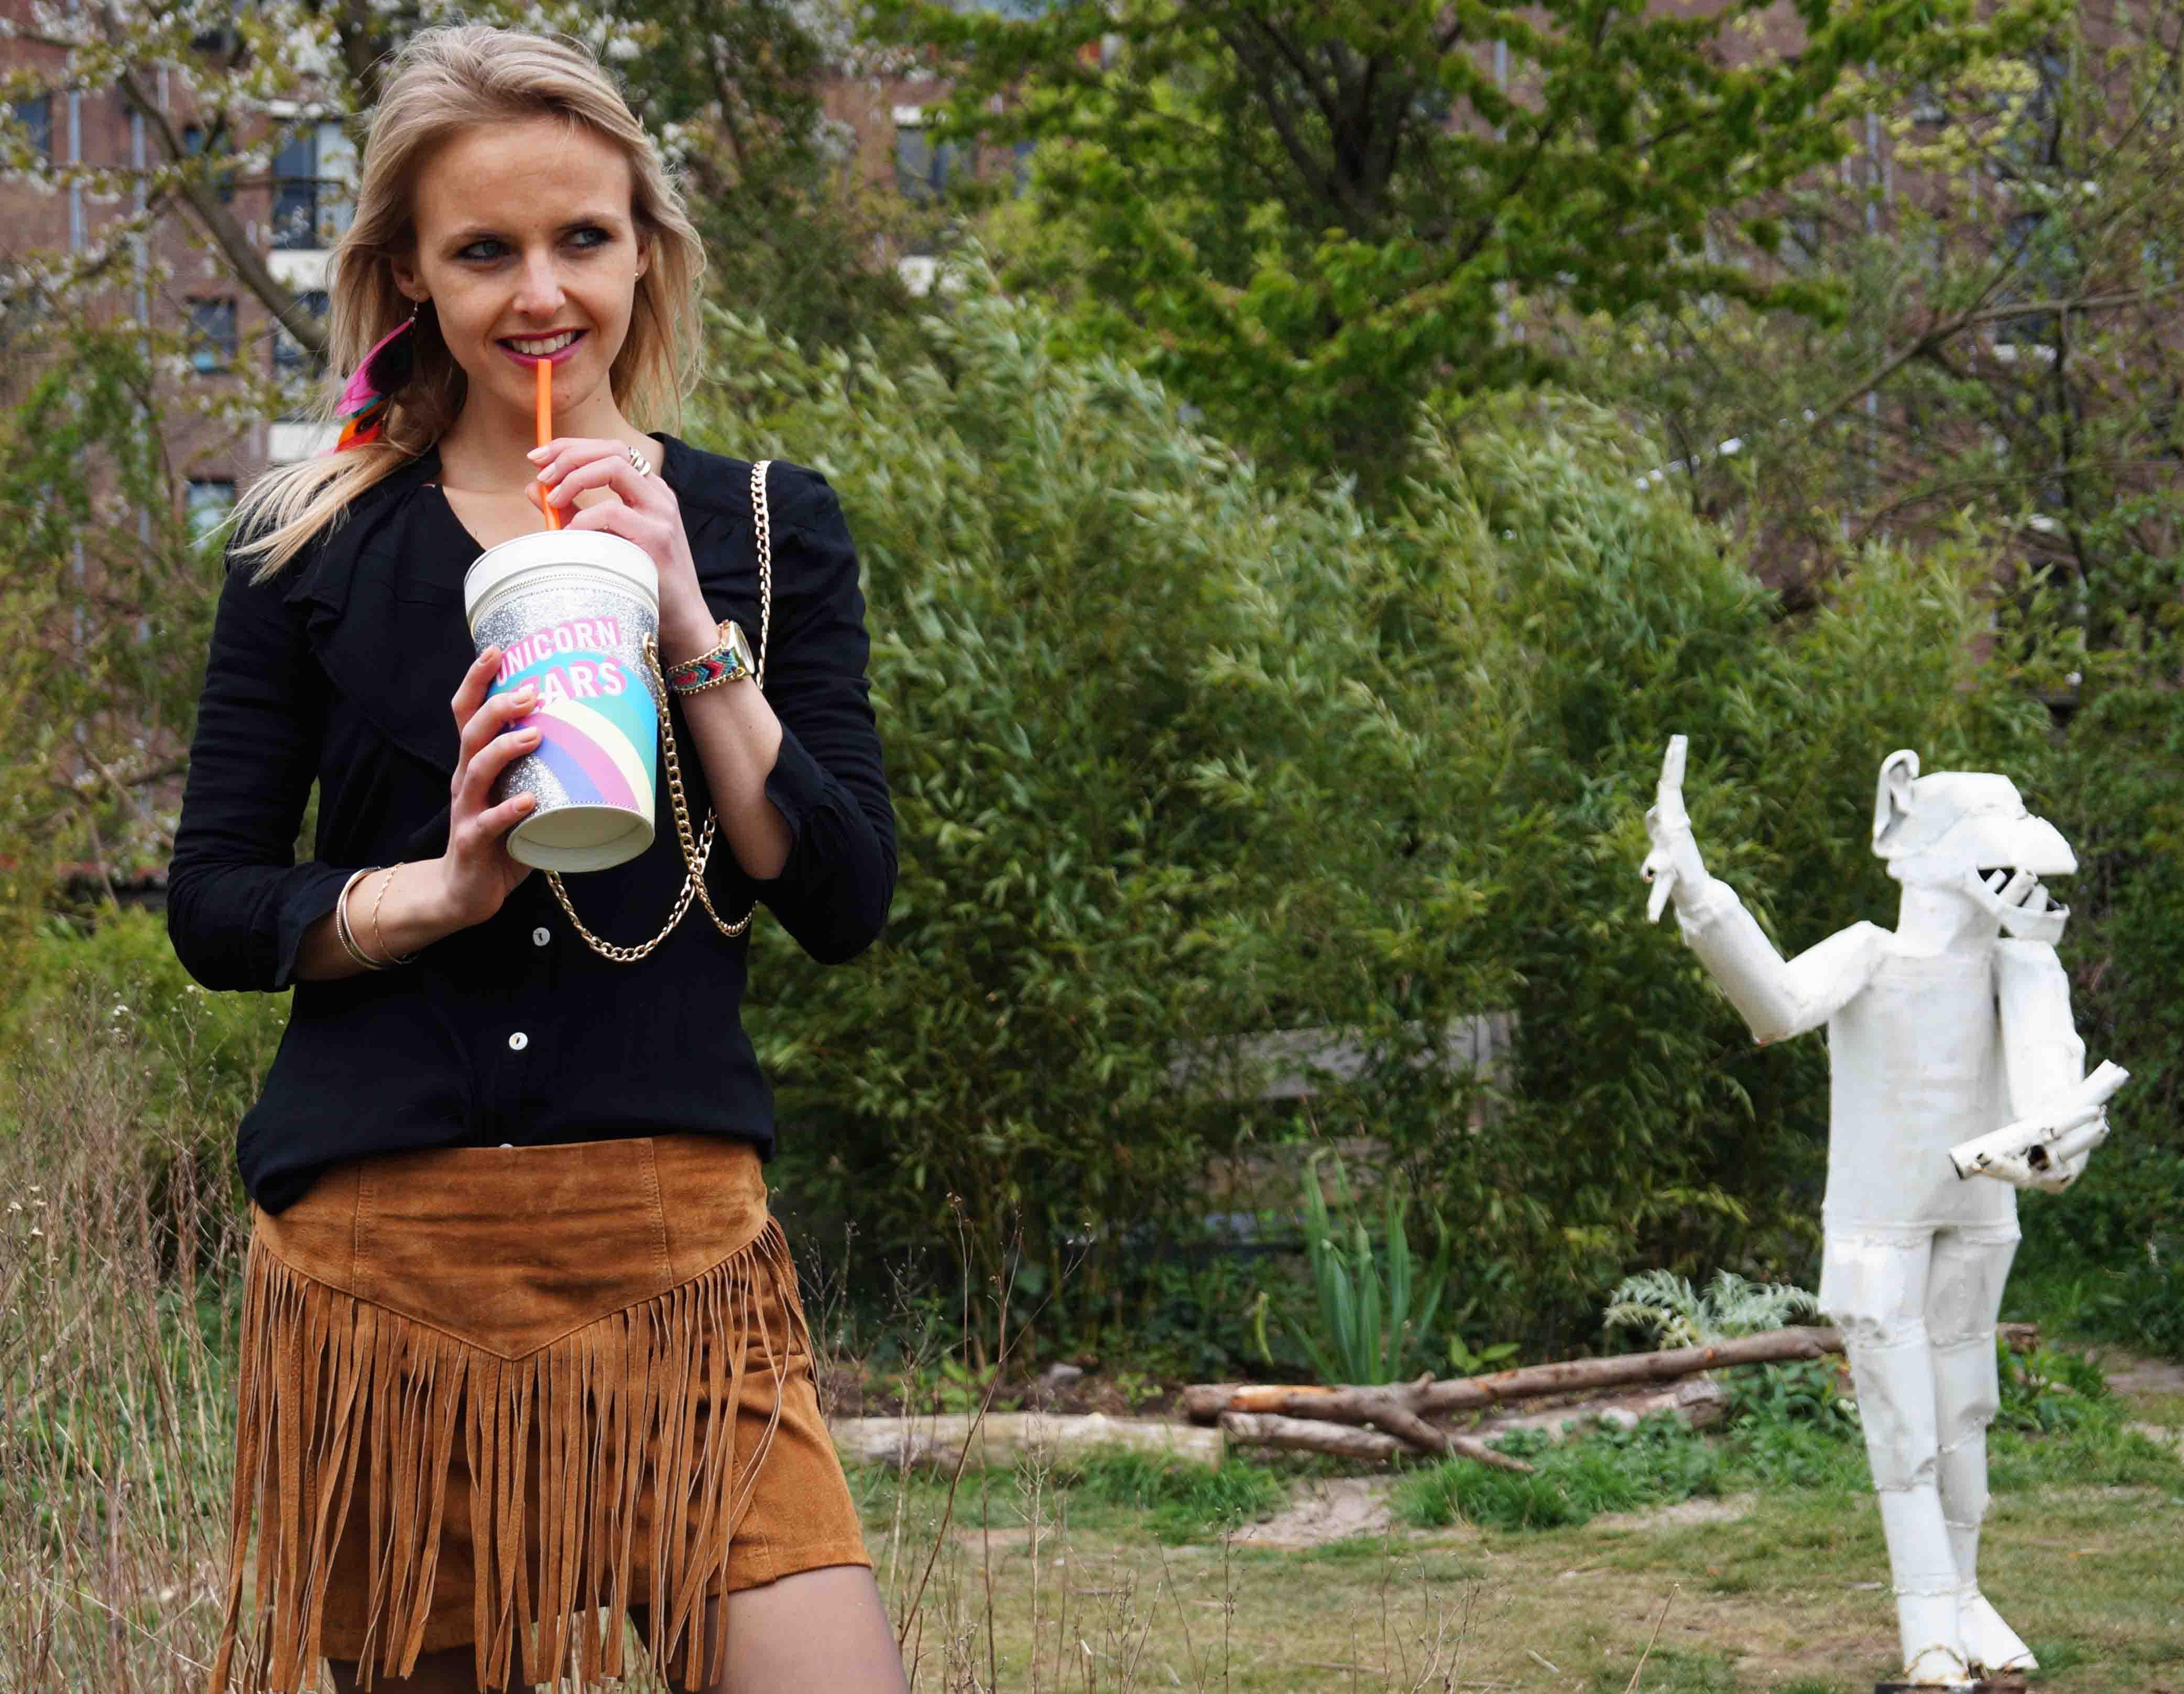 Bag at You - Fashion Blog - Have a drink - Festival outfit - oodt - Franje rok - Party Bag - Milkshake tas - Unicorn schoudertas